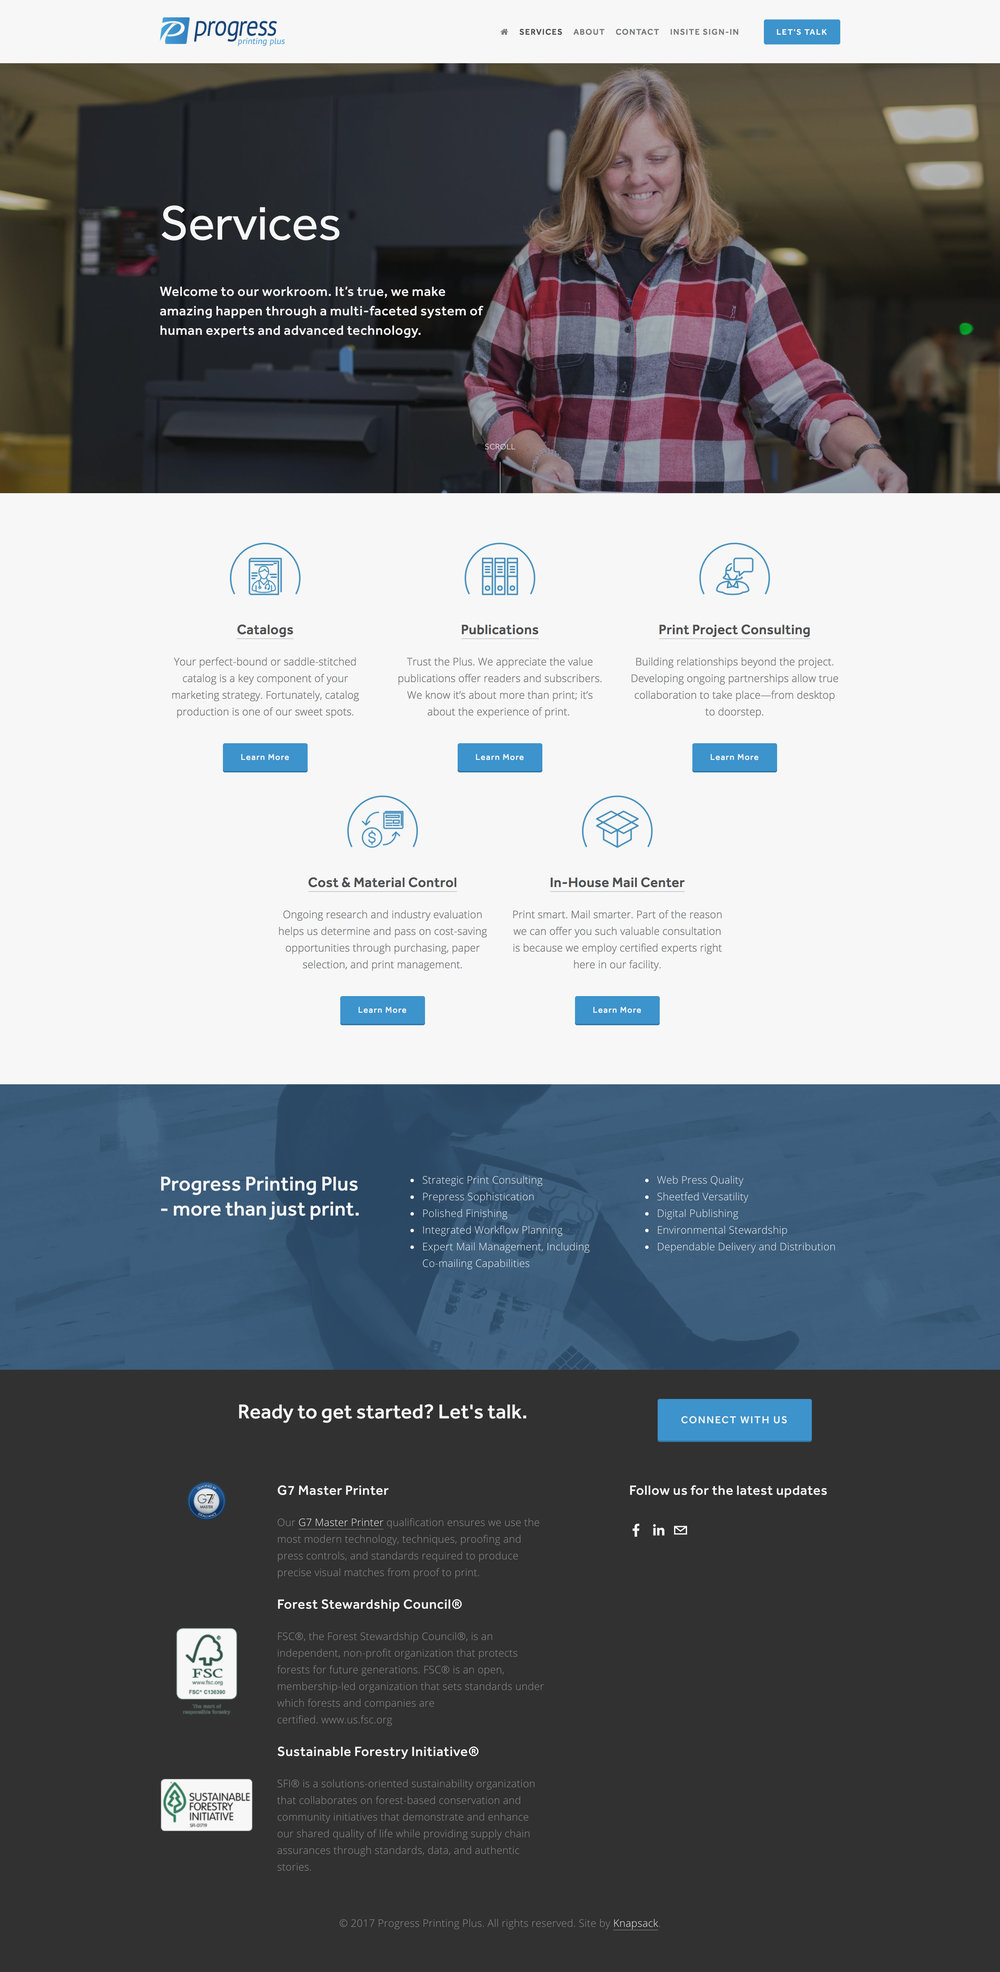 progress-printing-plus-services.jpg